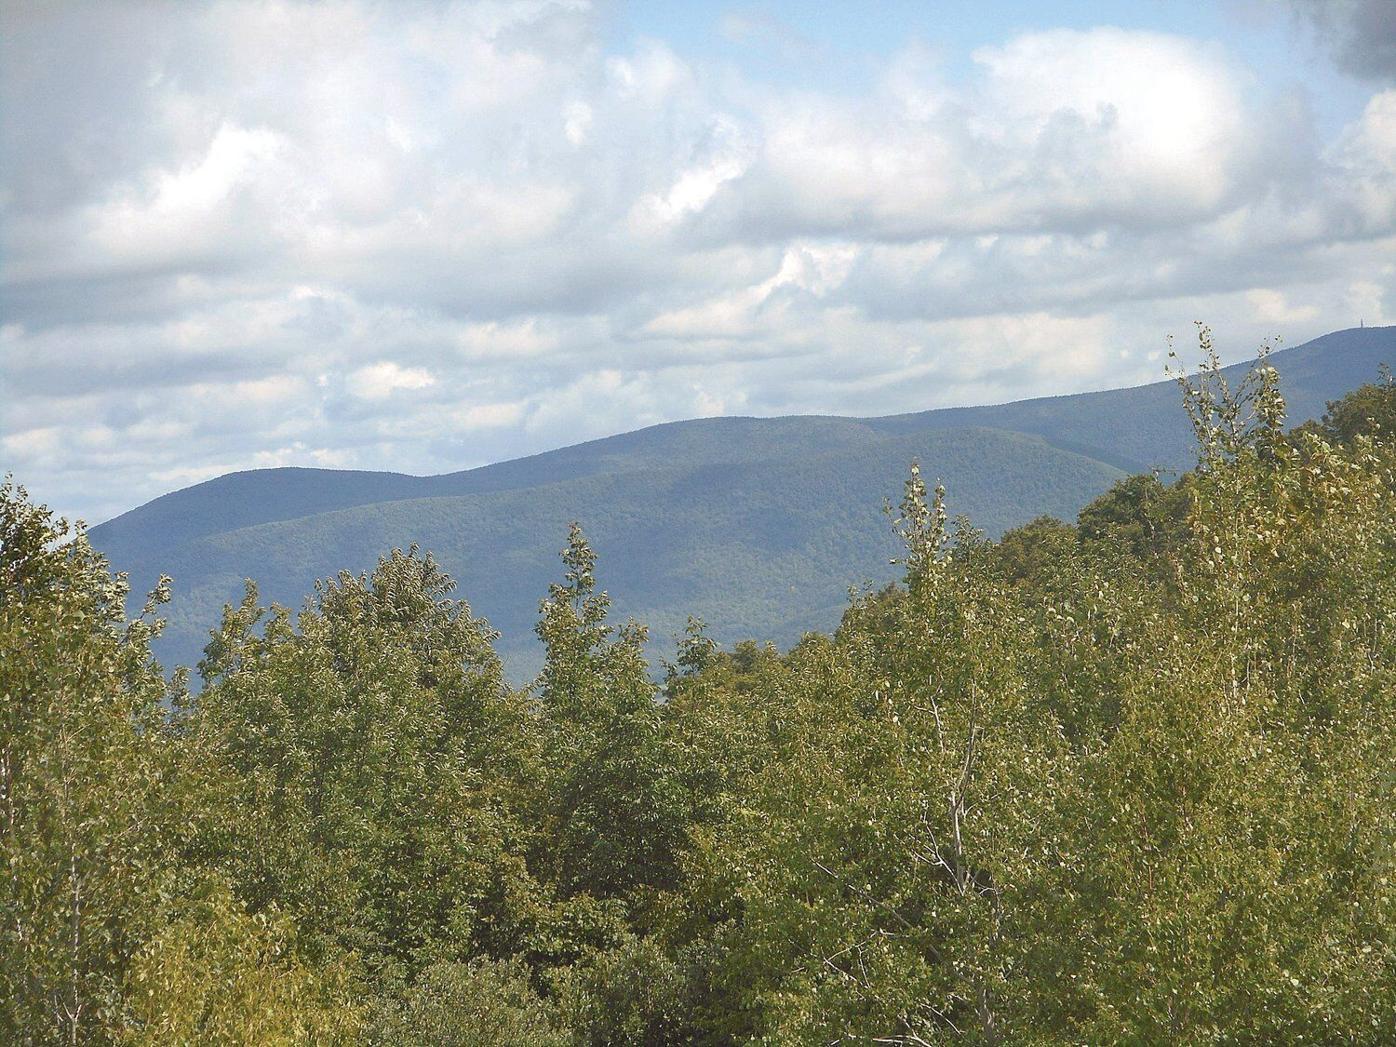 Lauren R. Stevens | Hikes & Walks: Head through Tenney land to get to Petersburg Pass